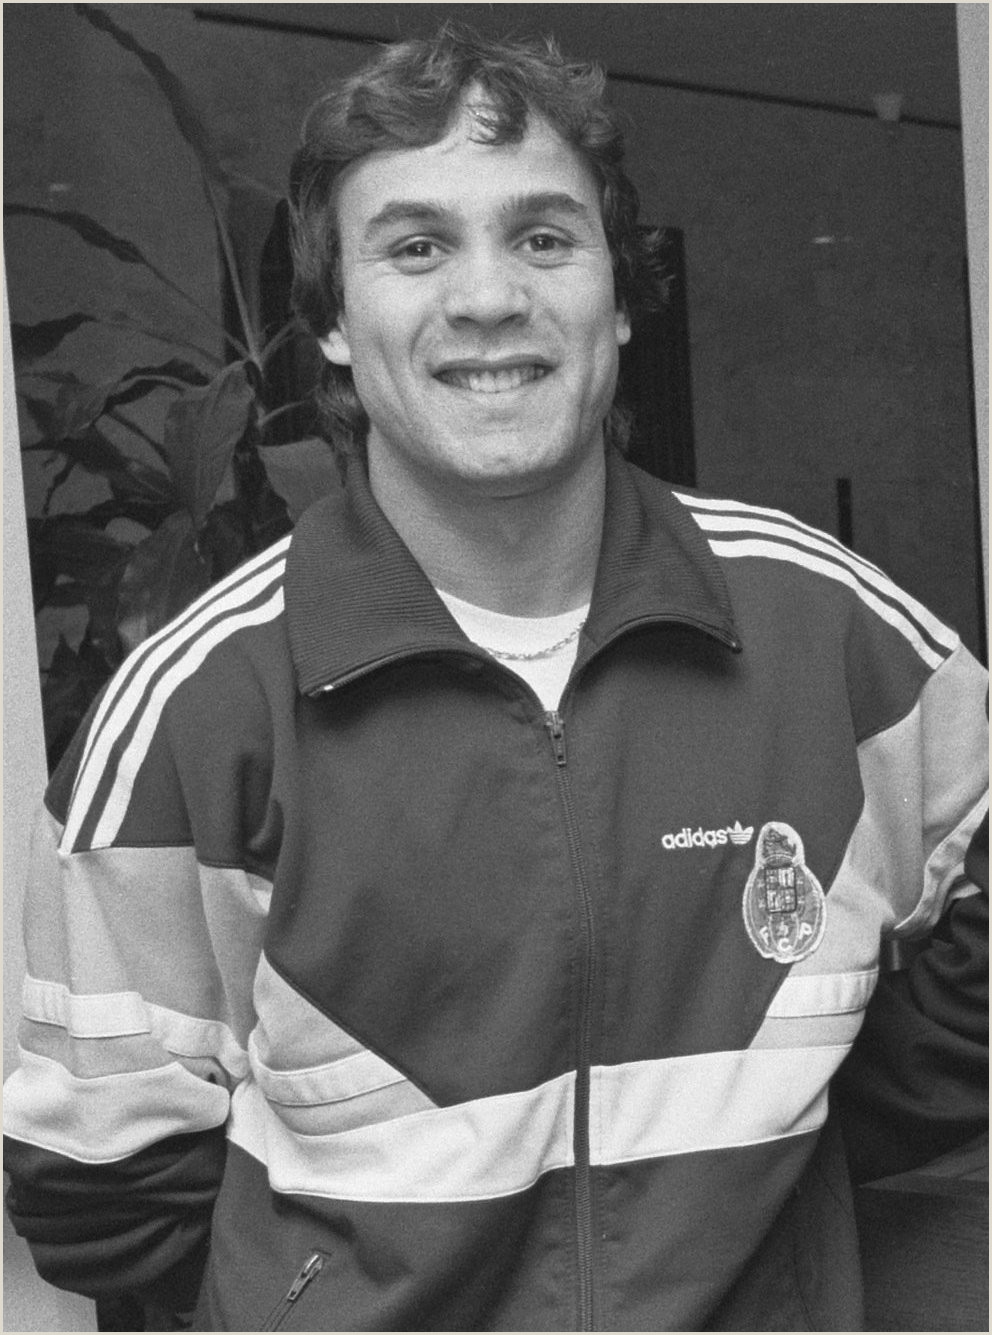 Exemple De Cv De Joueur De Football Pdf Rabah Madjer — Wikipédia